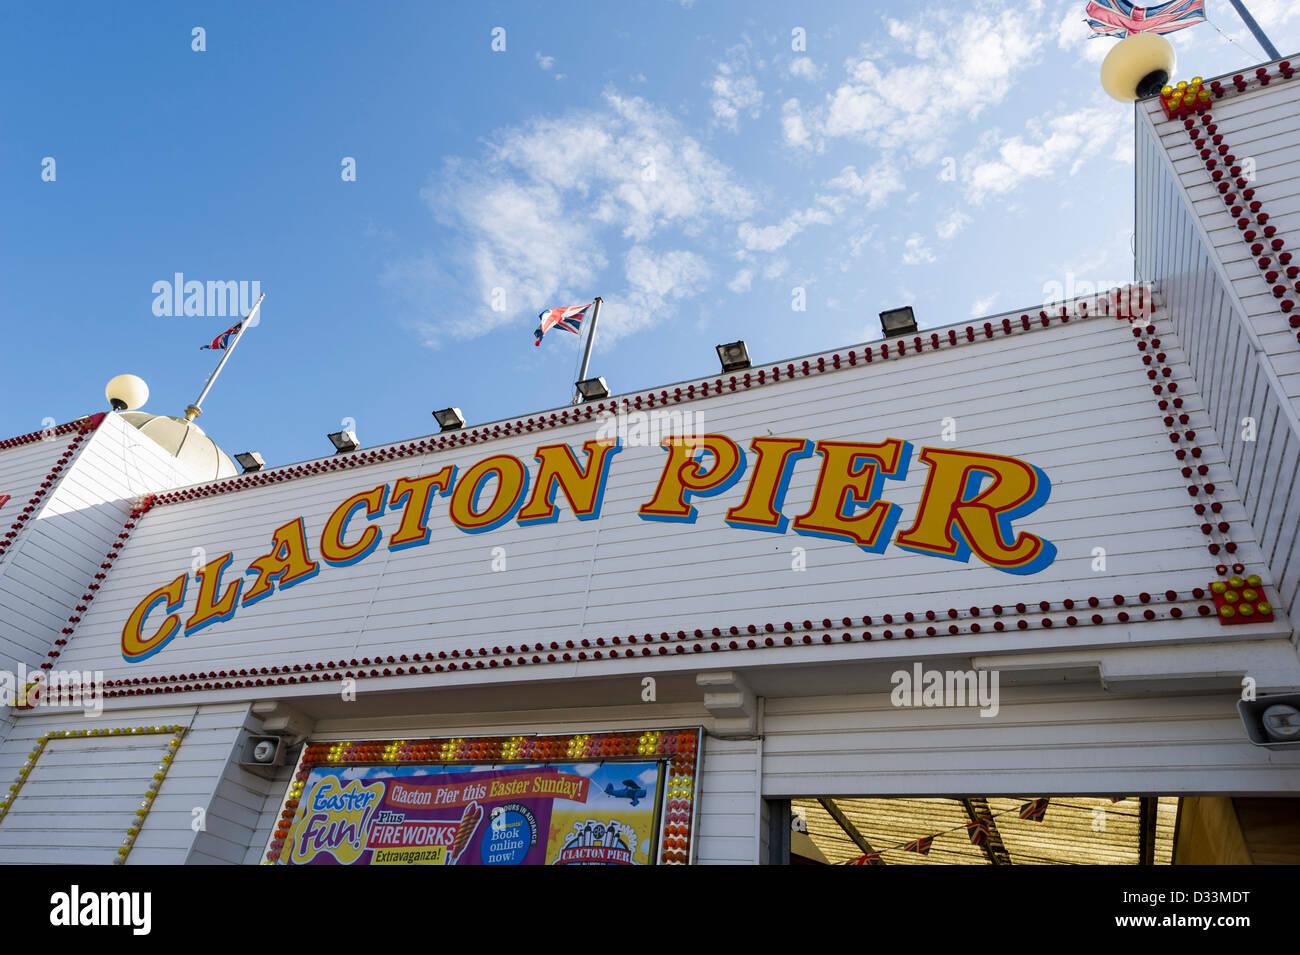 Clacton Pier in Essex, England, UK - Stock Image